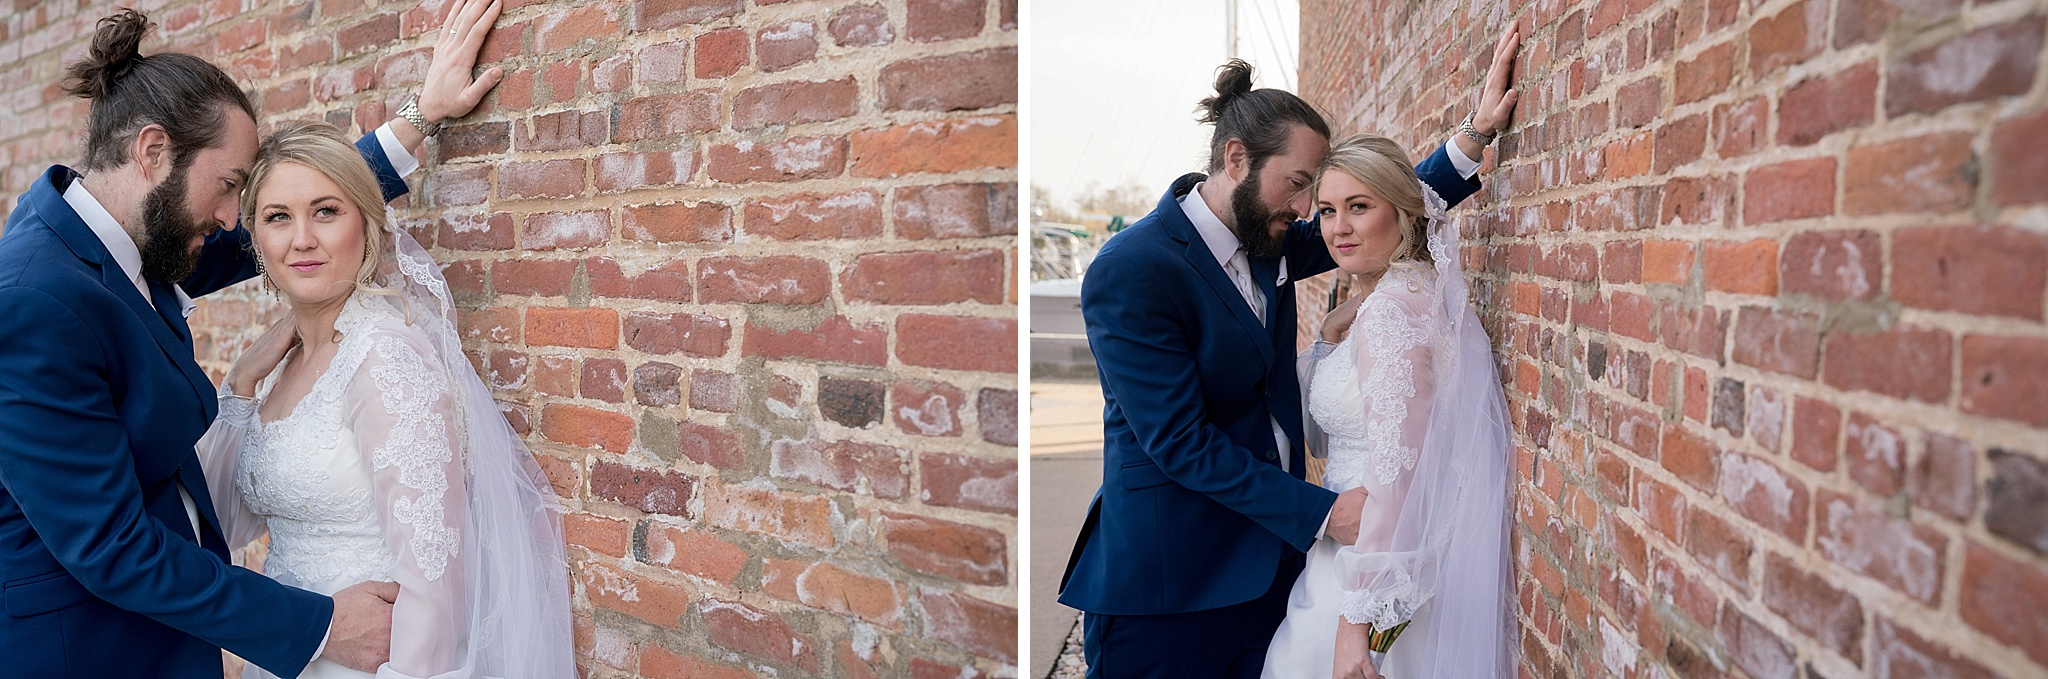 Washington-NC-Wedding-Photography-210.jpg